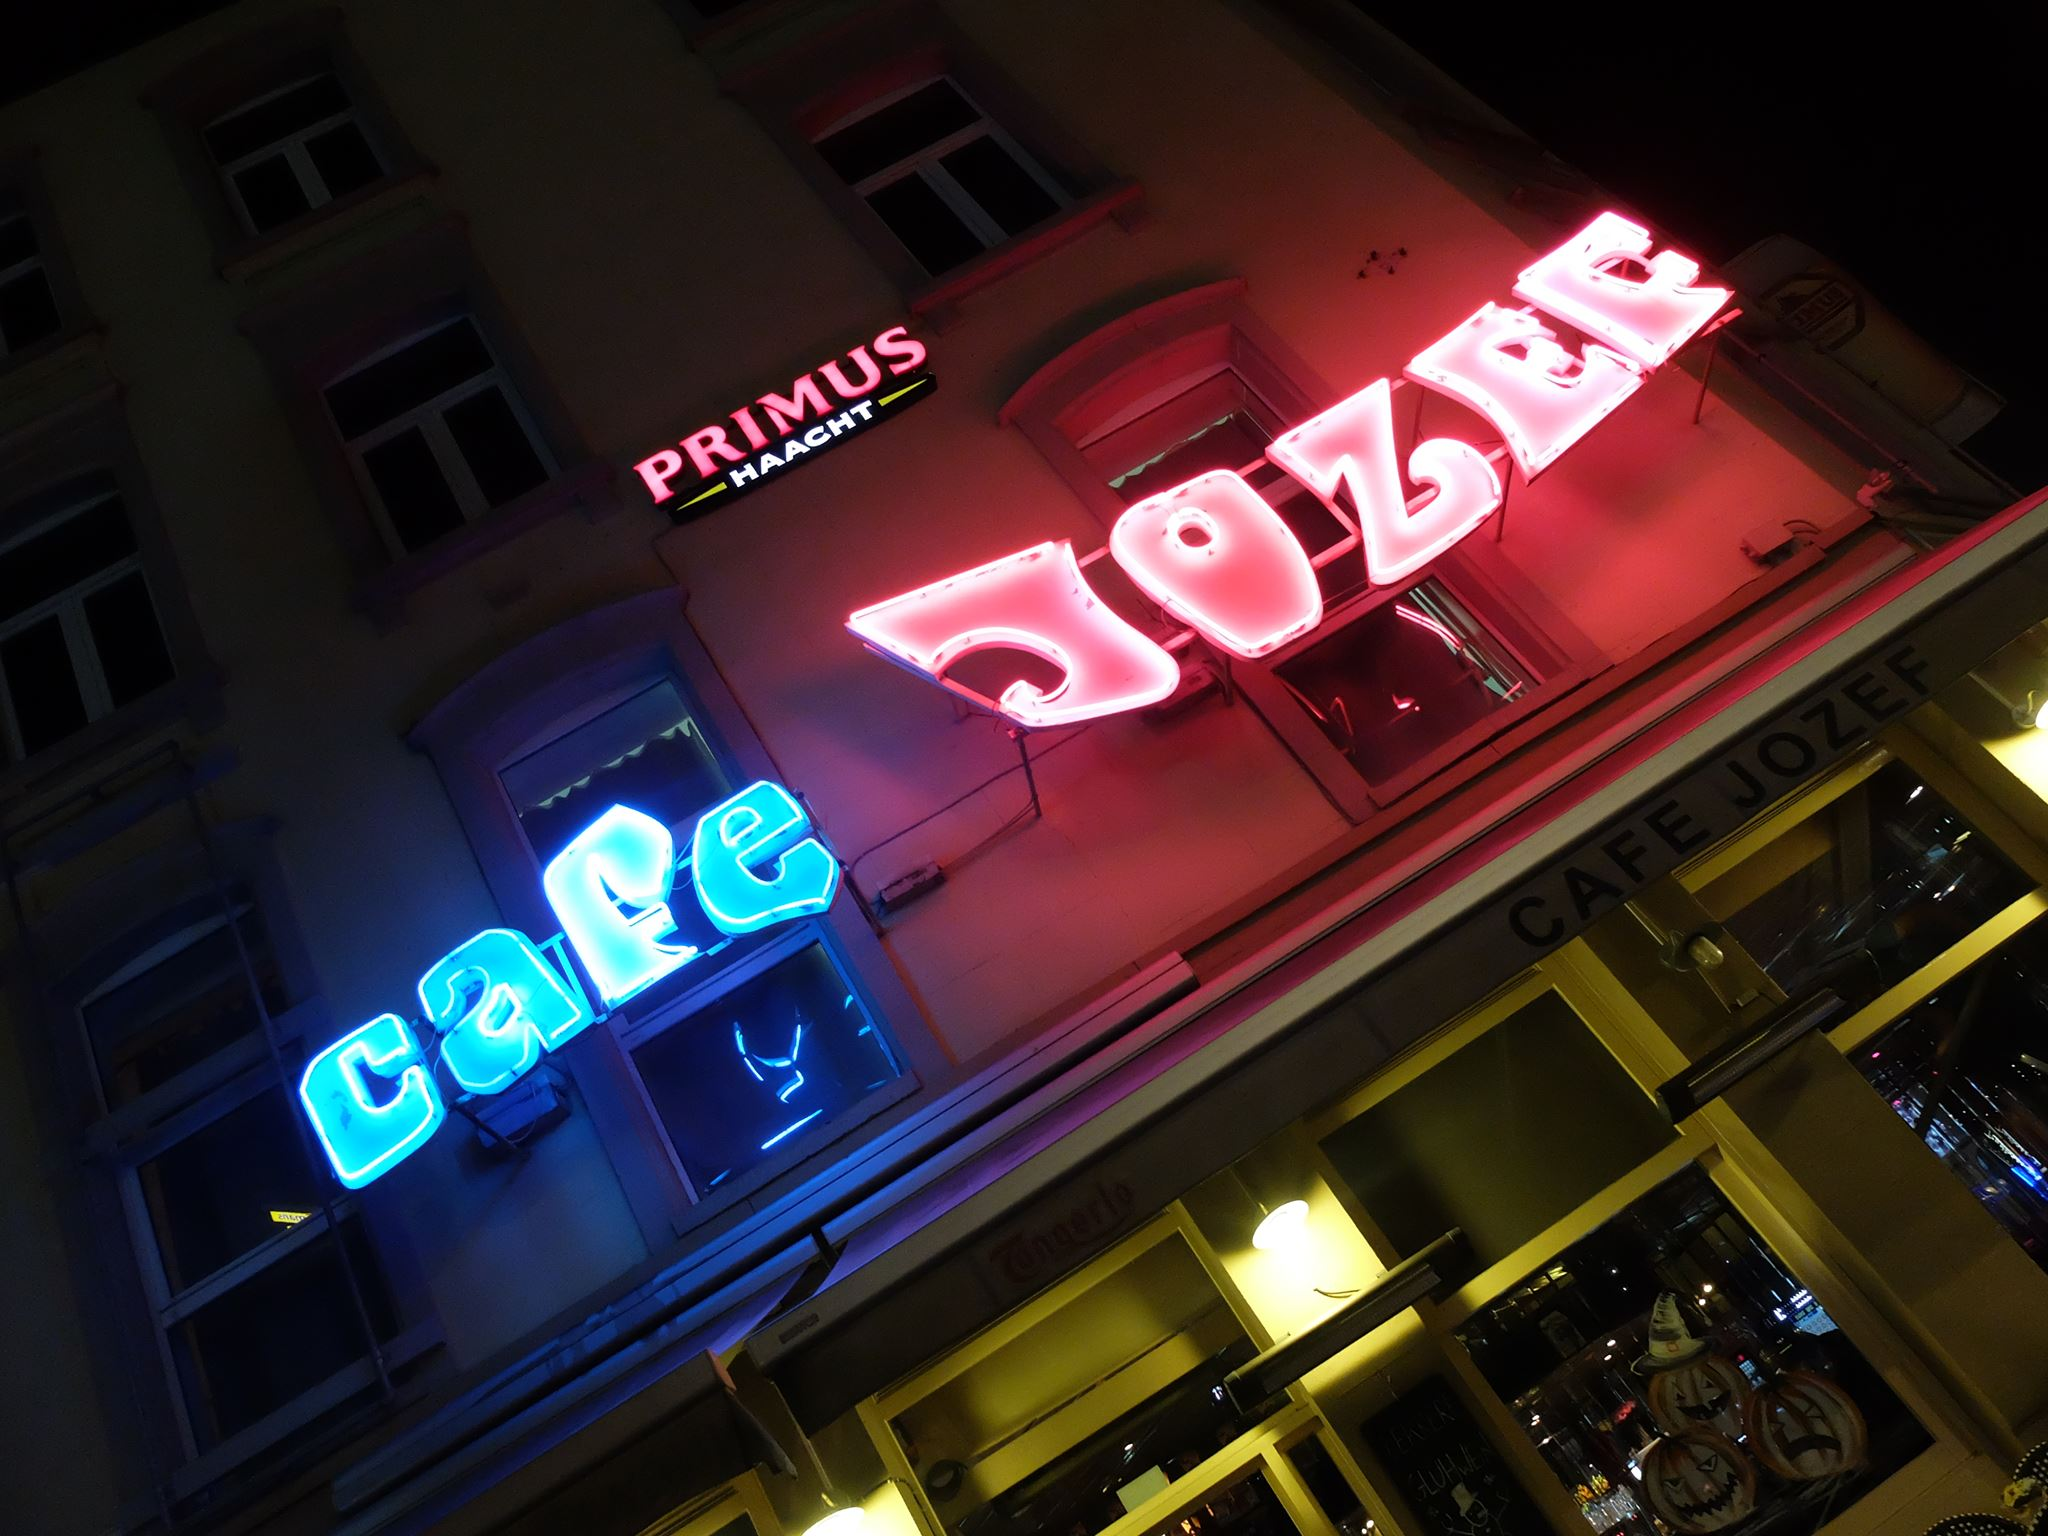 Cafe Jozef